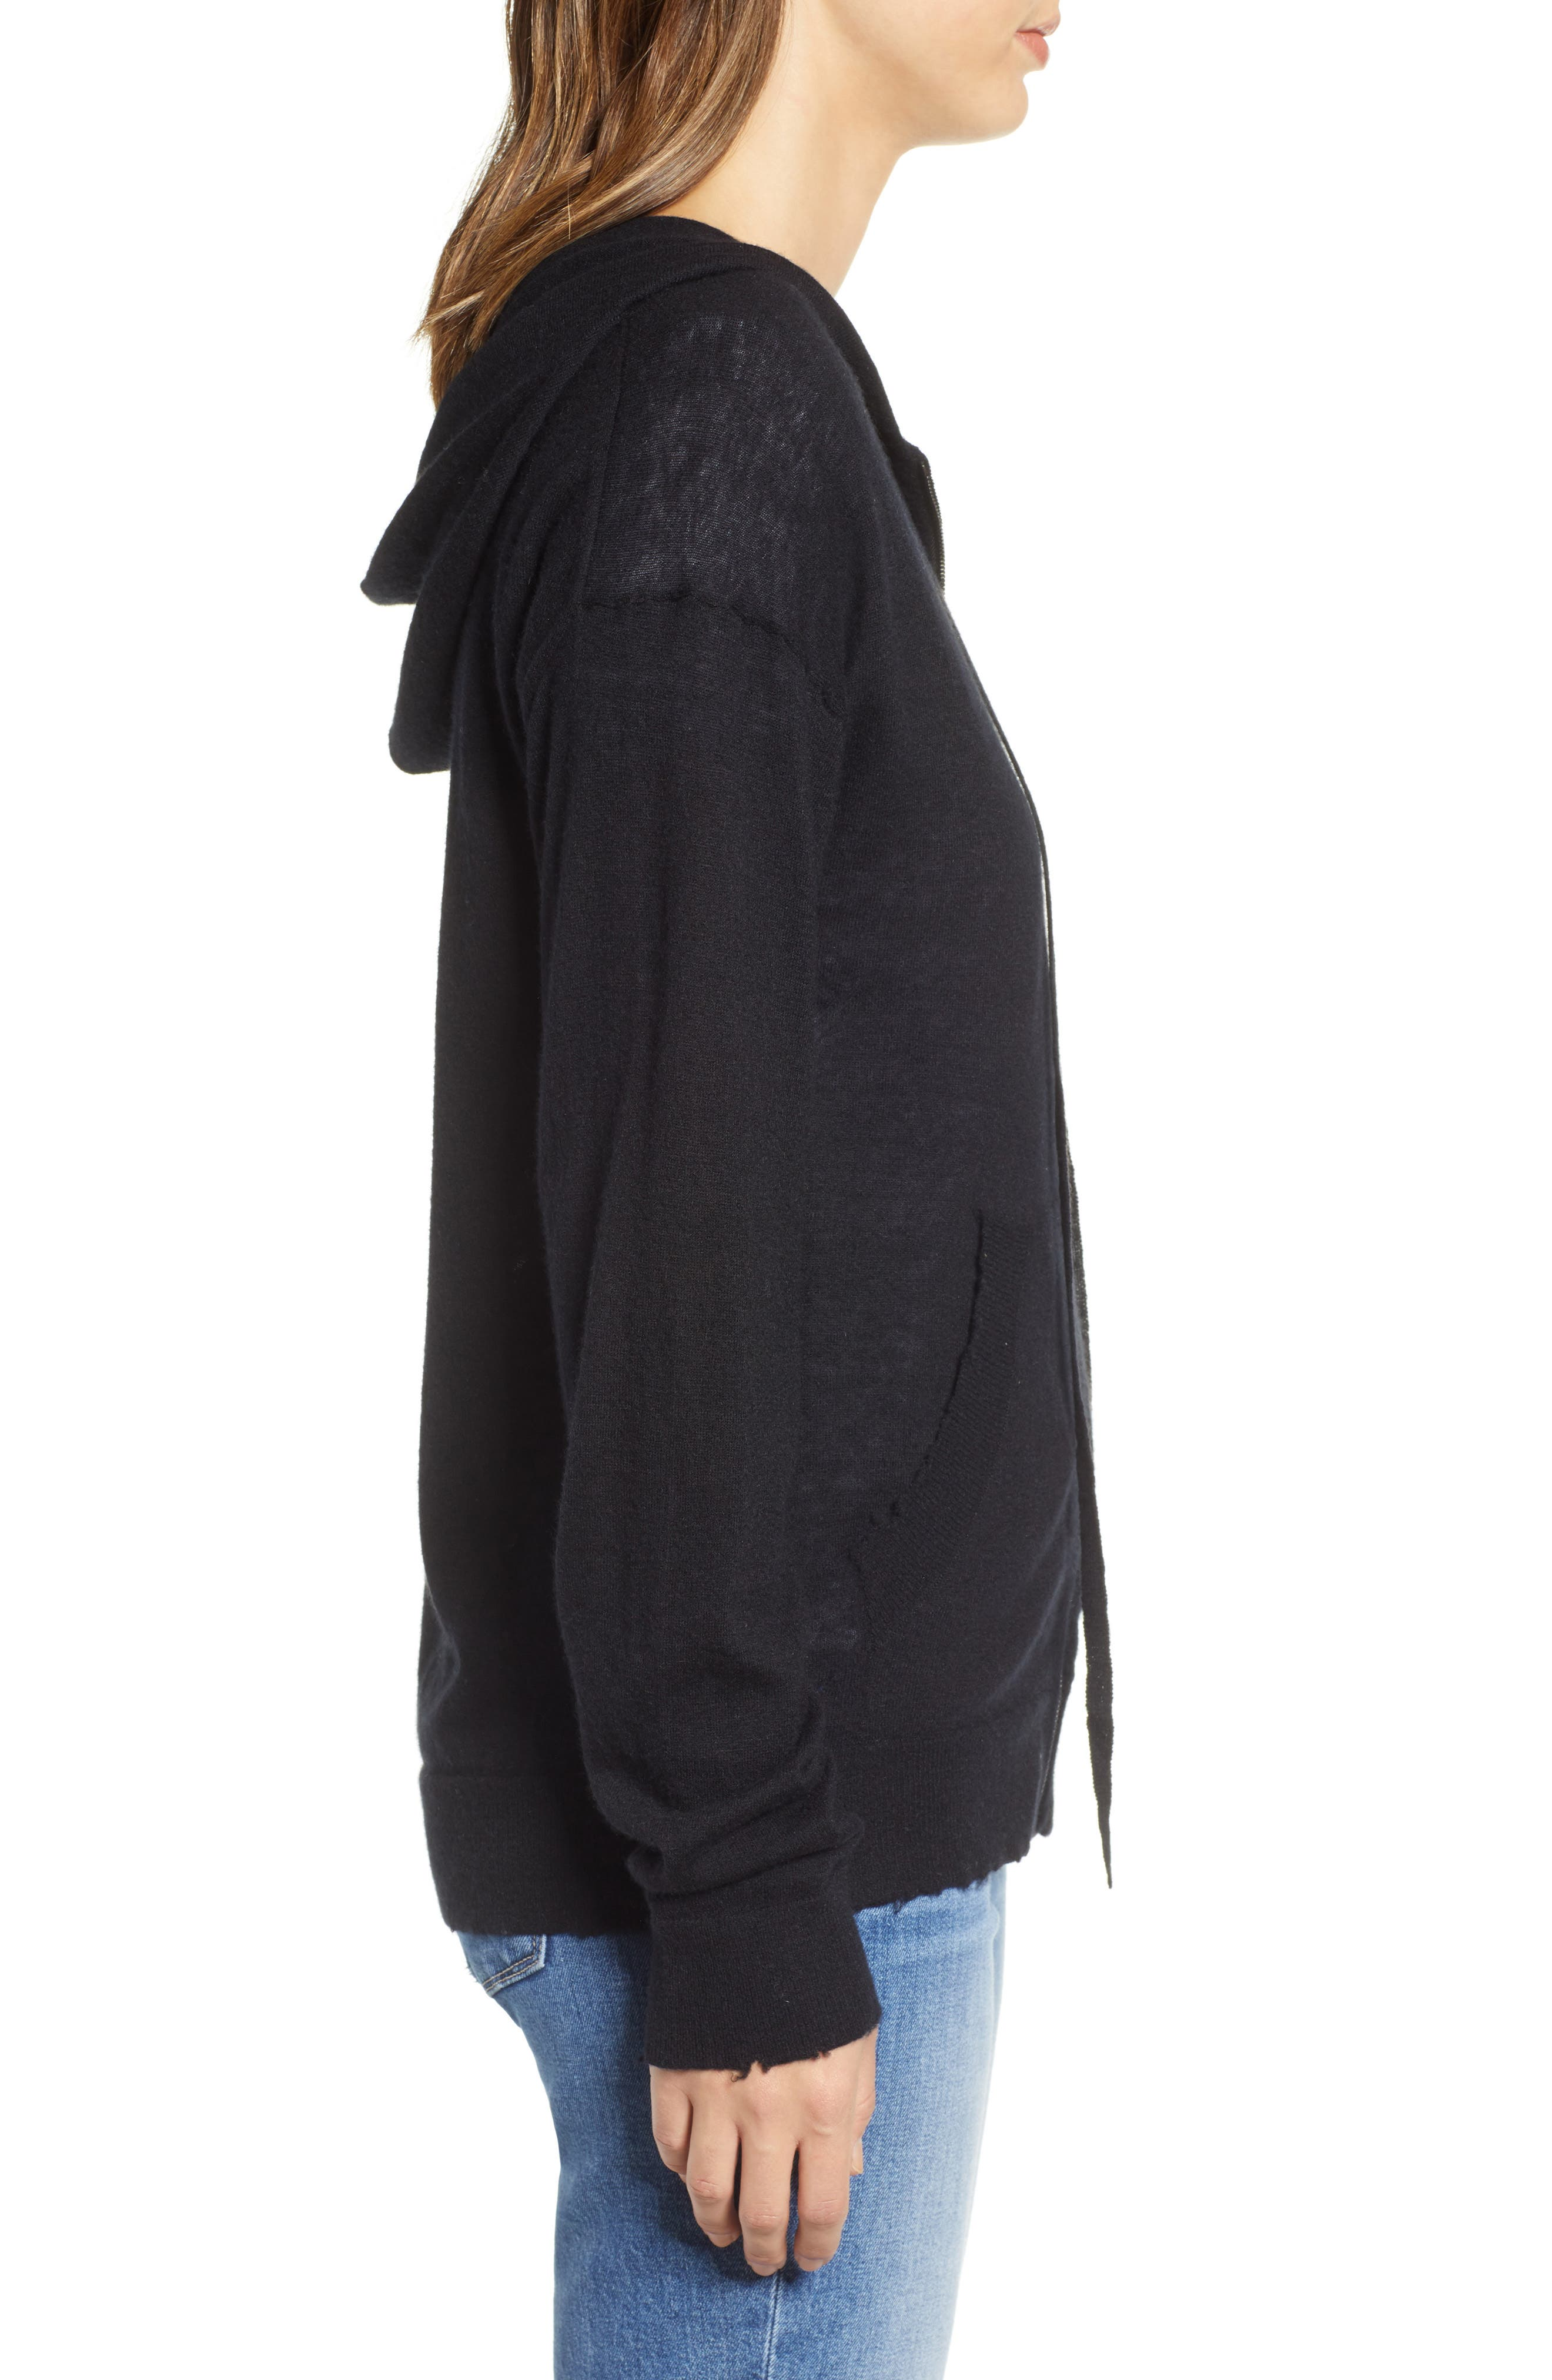 ZADIG & VOLTAIRE,                             Sixtine Bis Cashmere Zip Sweater Hoodie,                             Alternate thumbnail 3, color,                             001